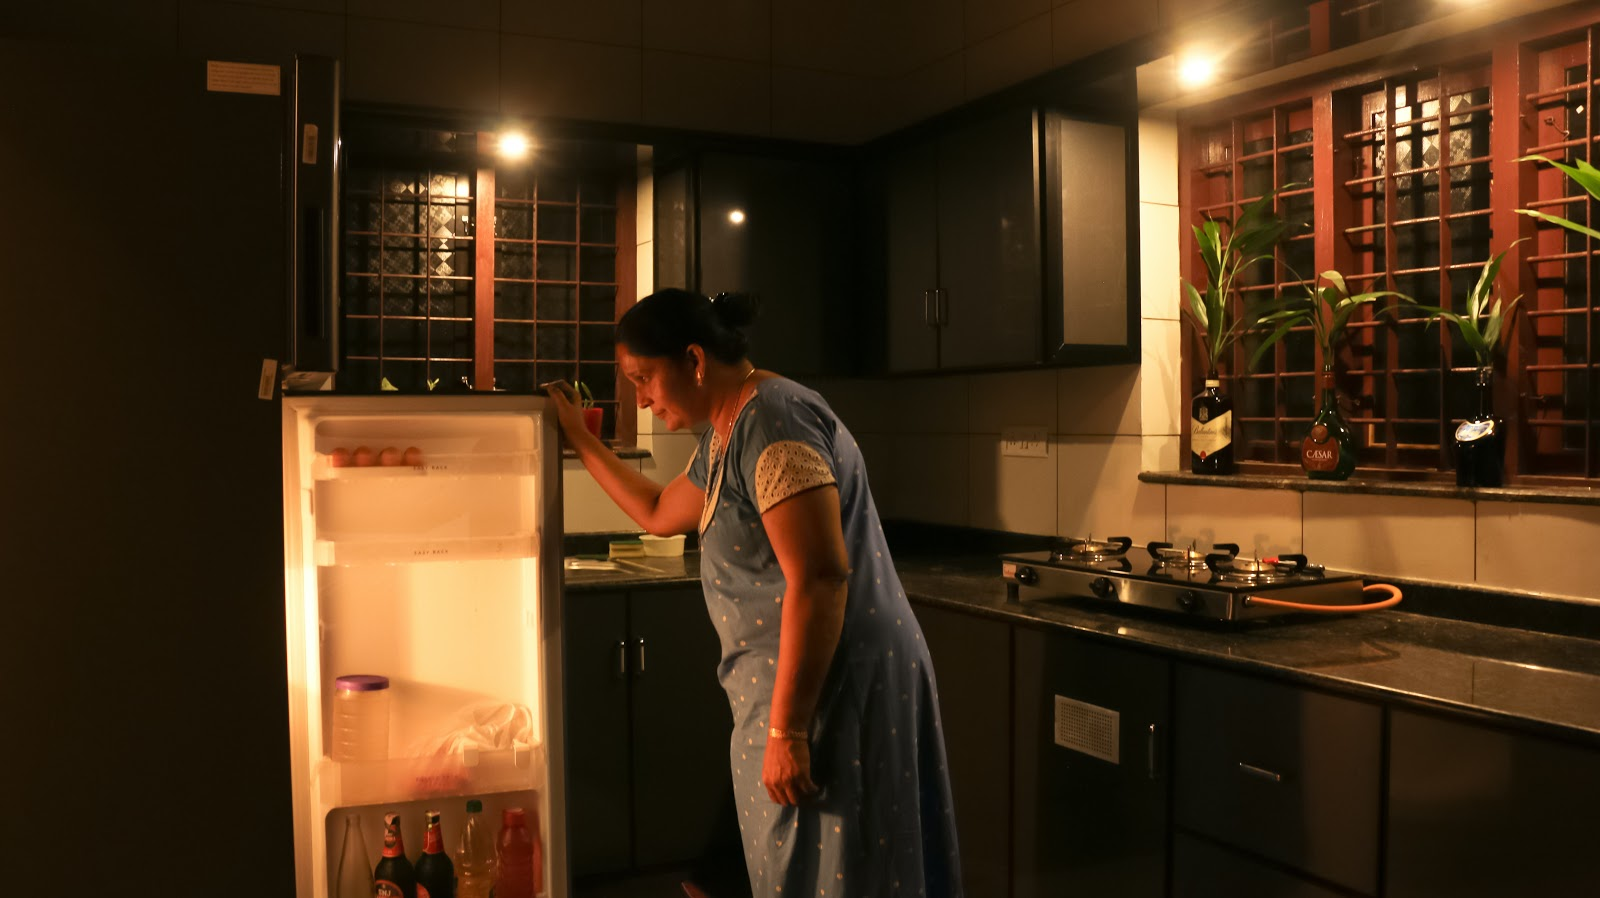 mc5La5Z4DfcnWZ80jc5gvexGXBczMeUe6L cgRzSBVdPcFgfcTbtOlbzgs9pW1cIqlO5wdGcnUp mm Best Double Door Refrigerator in India